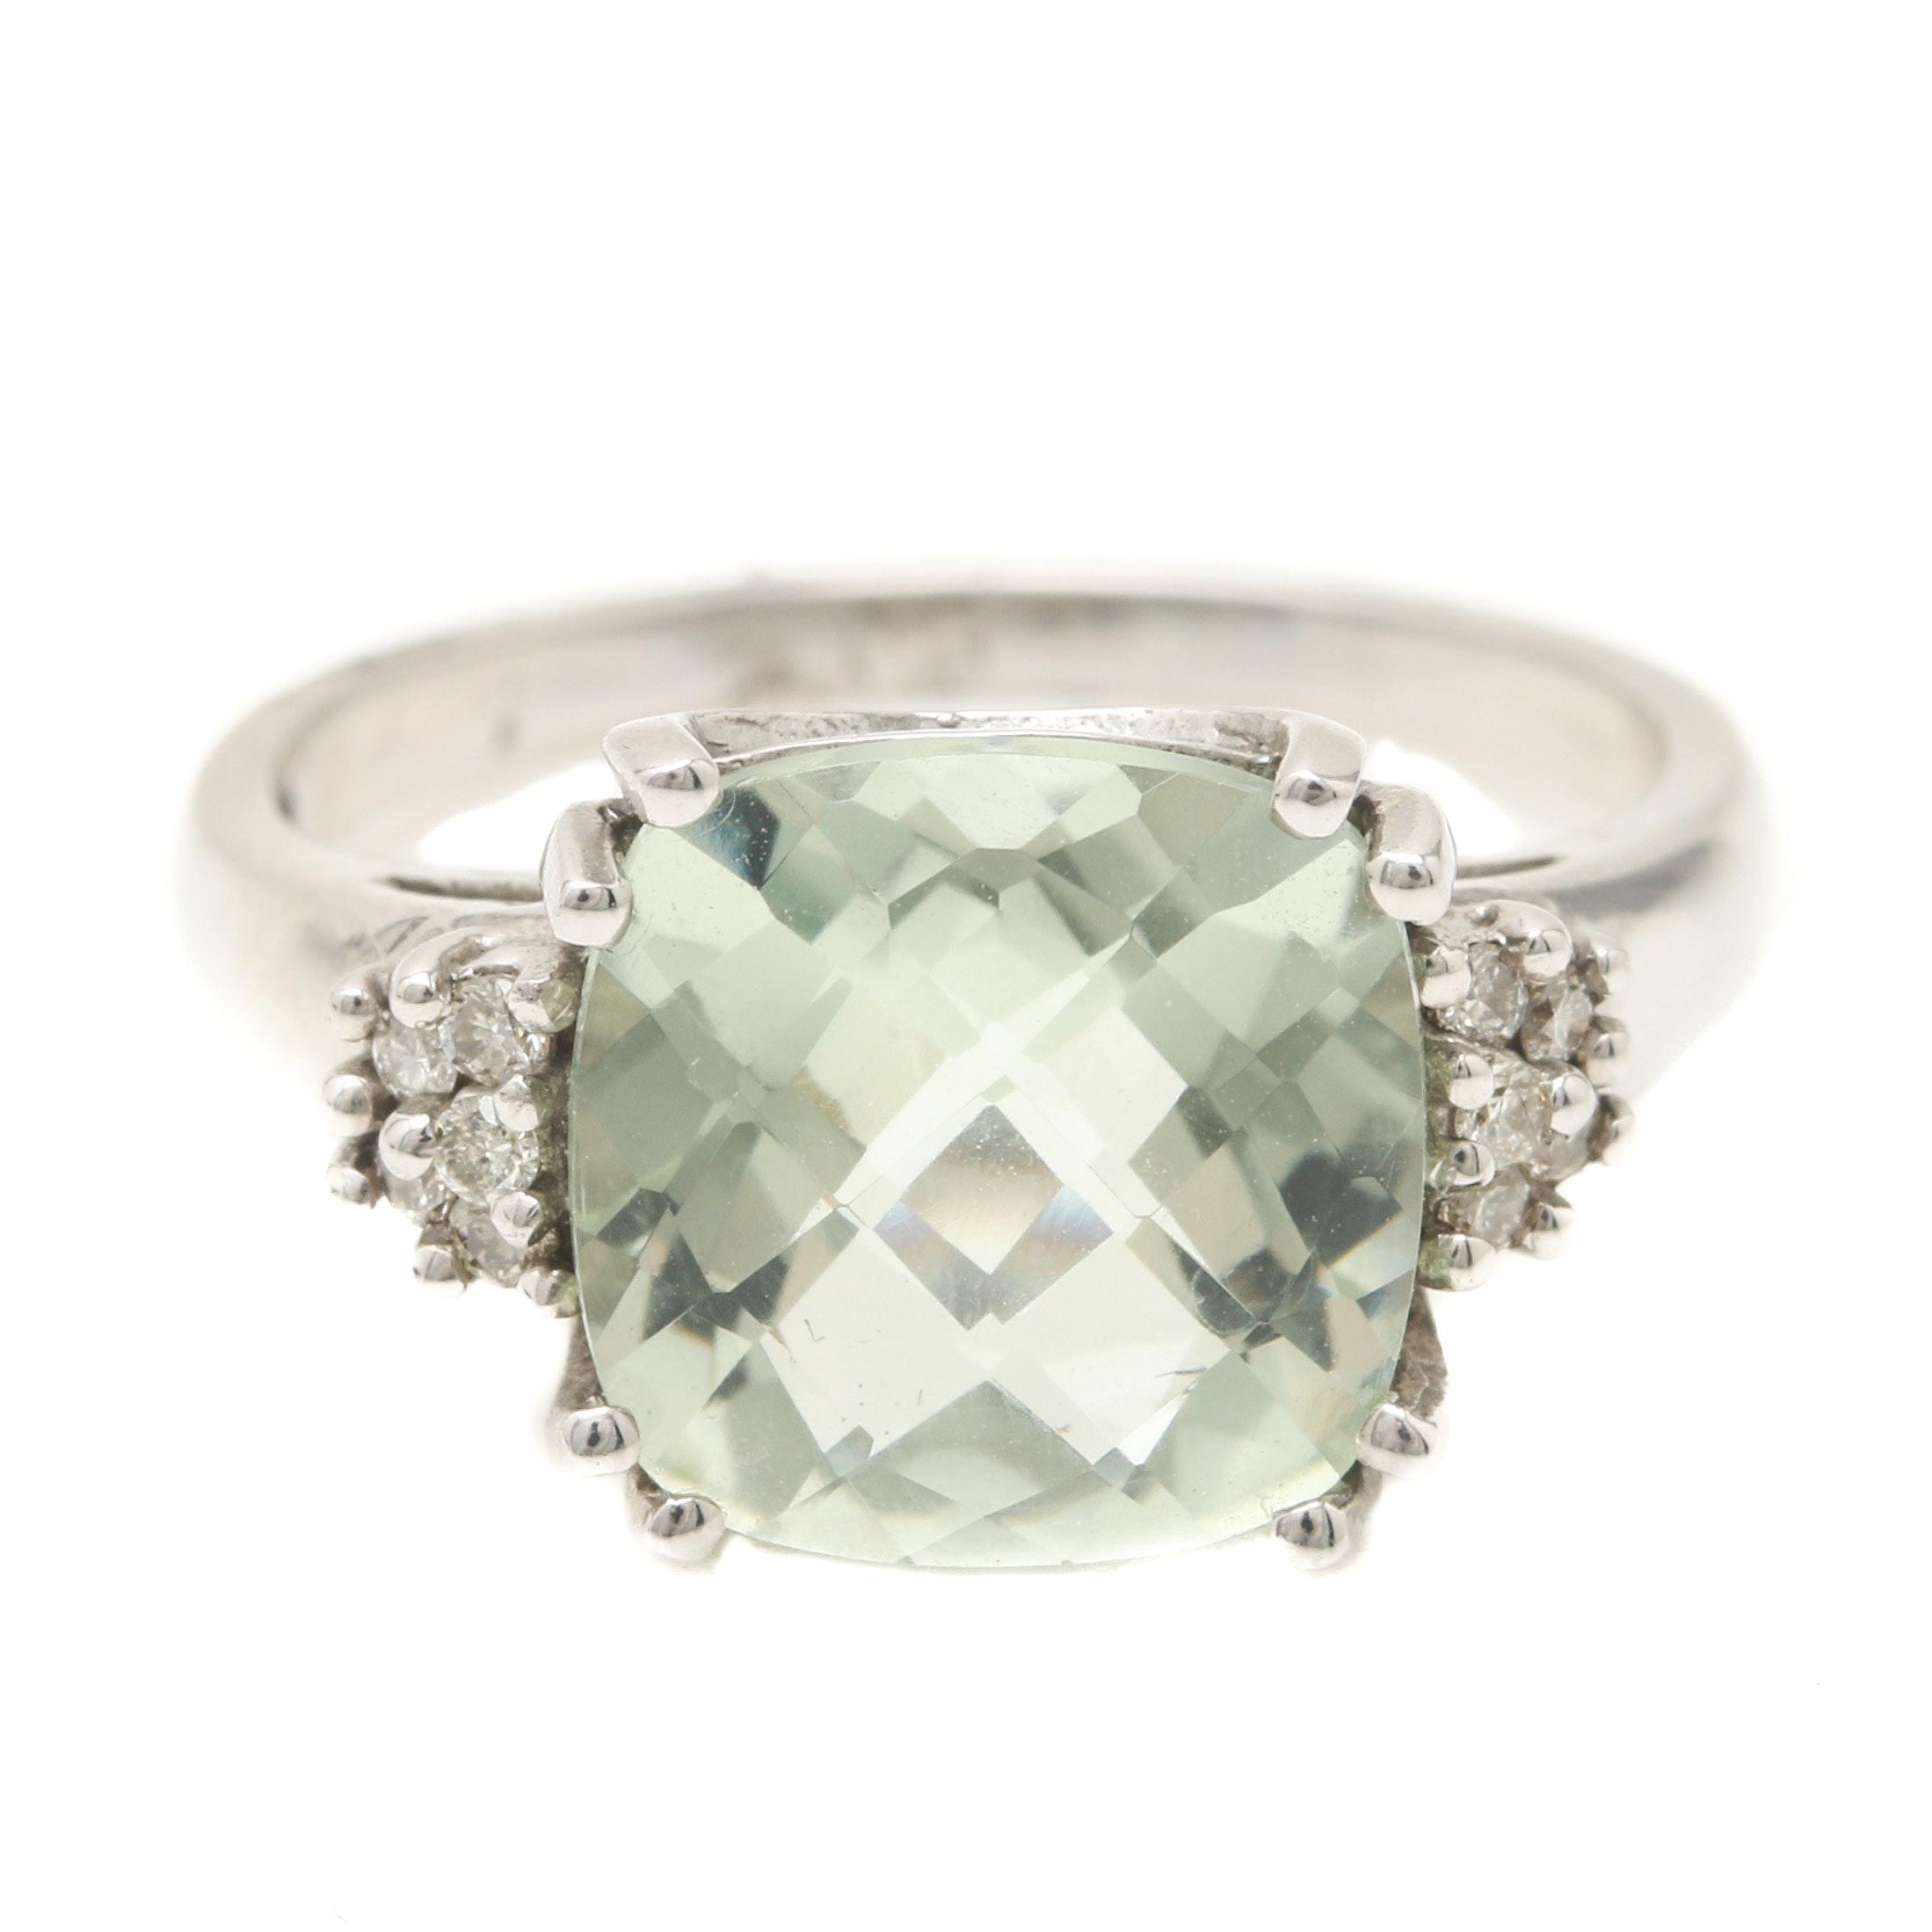 10K White Gold Praseolite and Diamond Ring